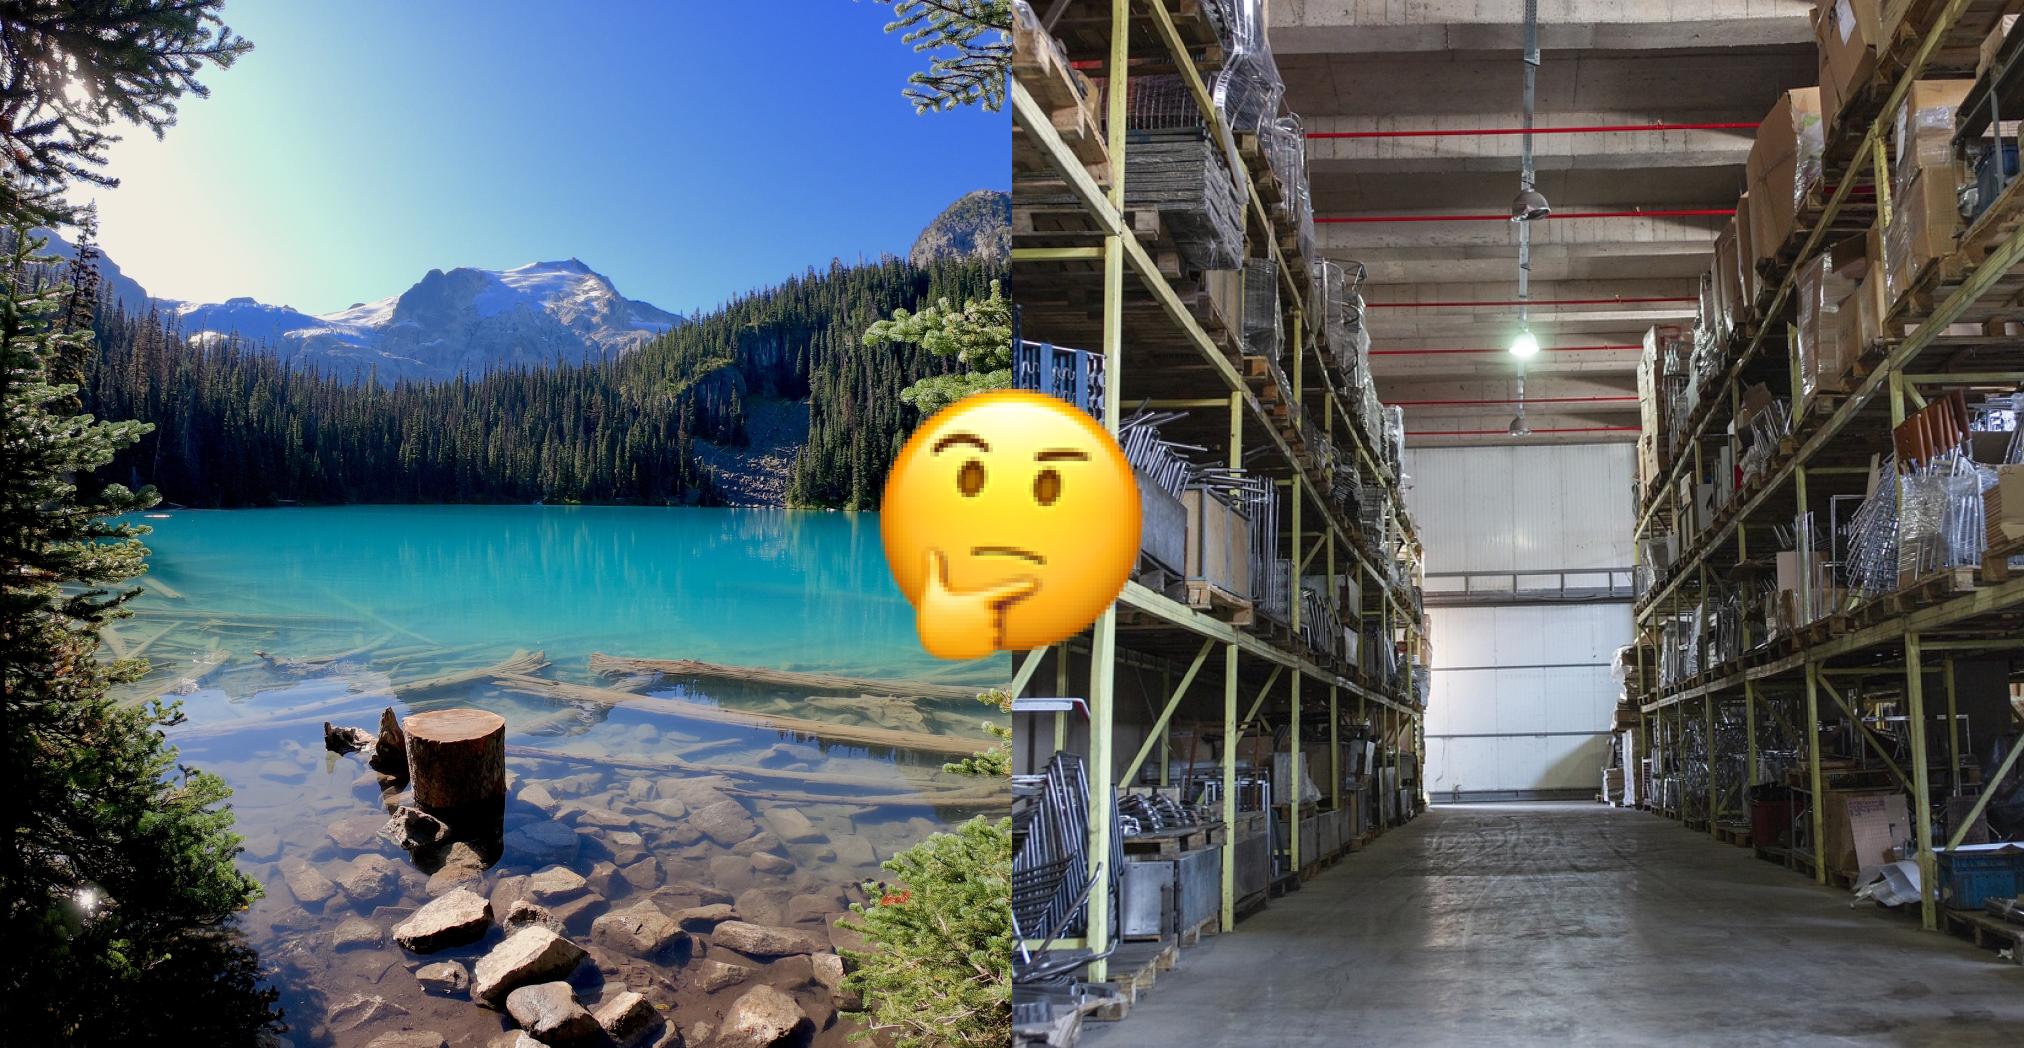 Data Storage 101: Data Lakes, Data Warehouses, and Data Marts